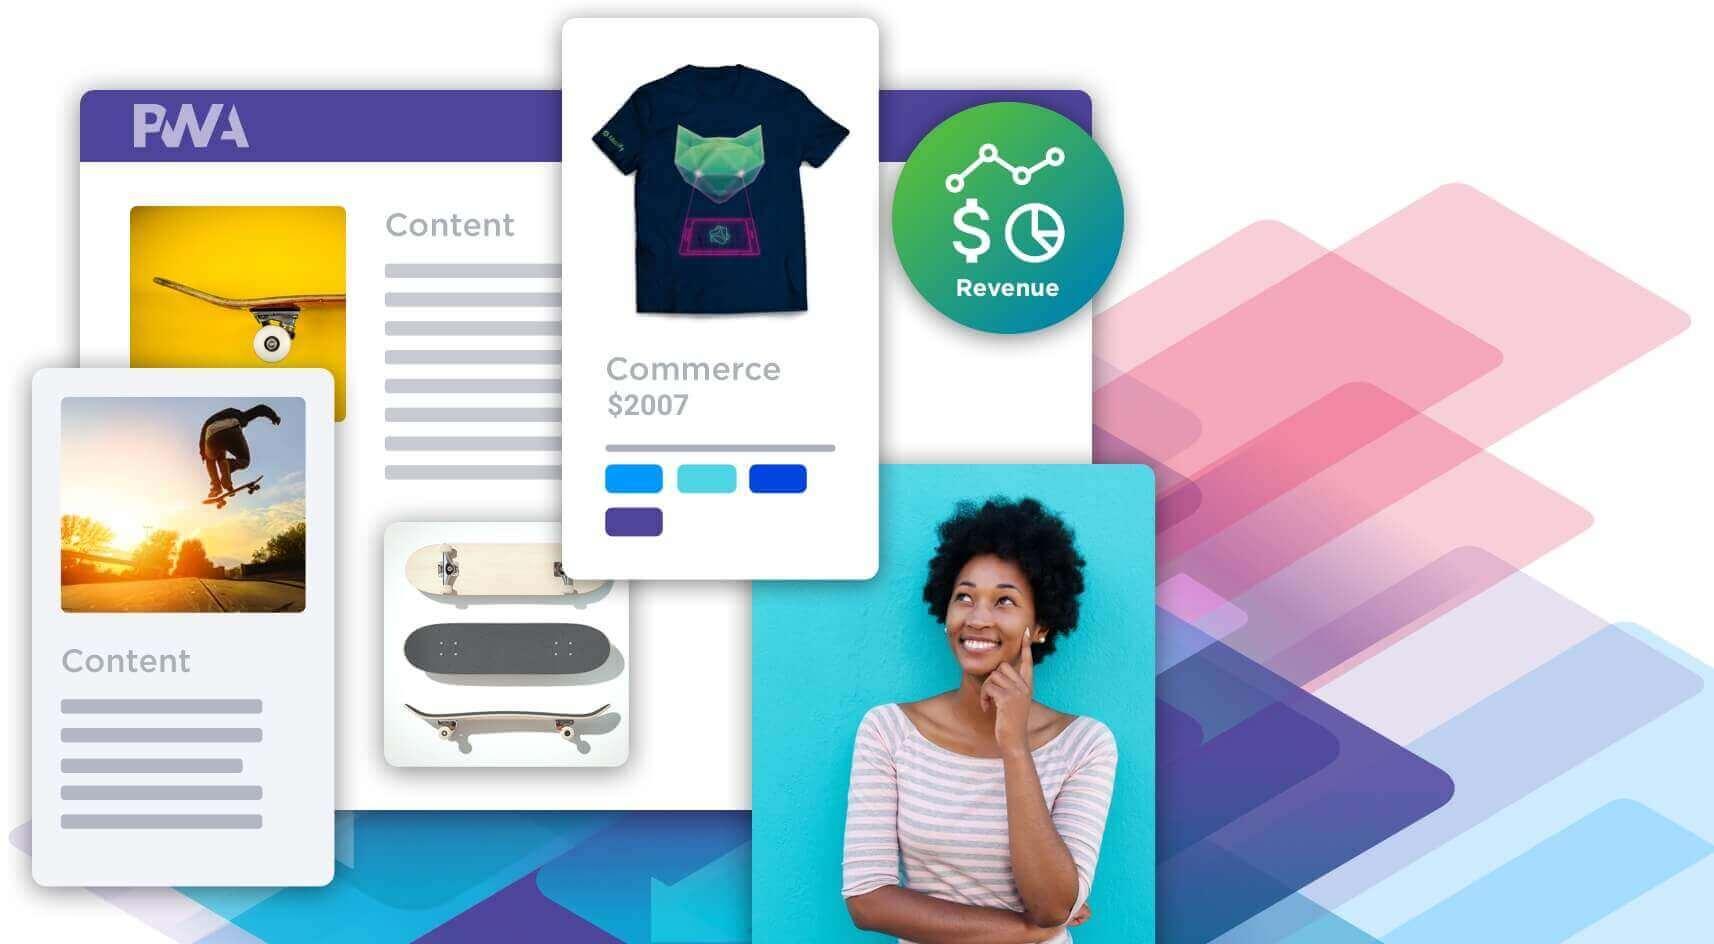 Most headless storefronts adopt Progressive Web Apps (PWA)